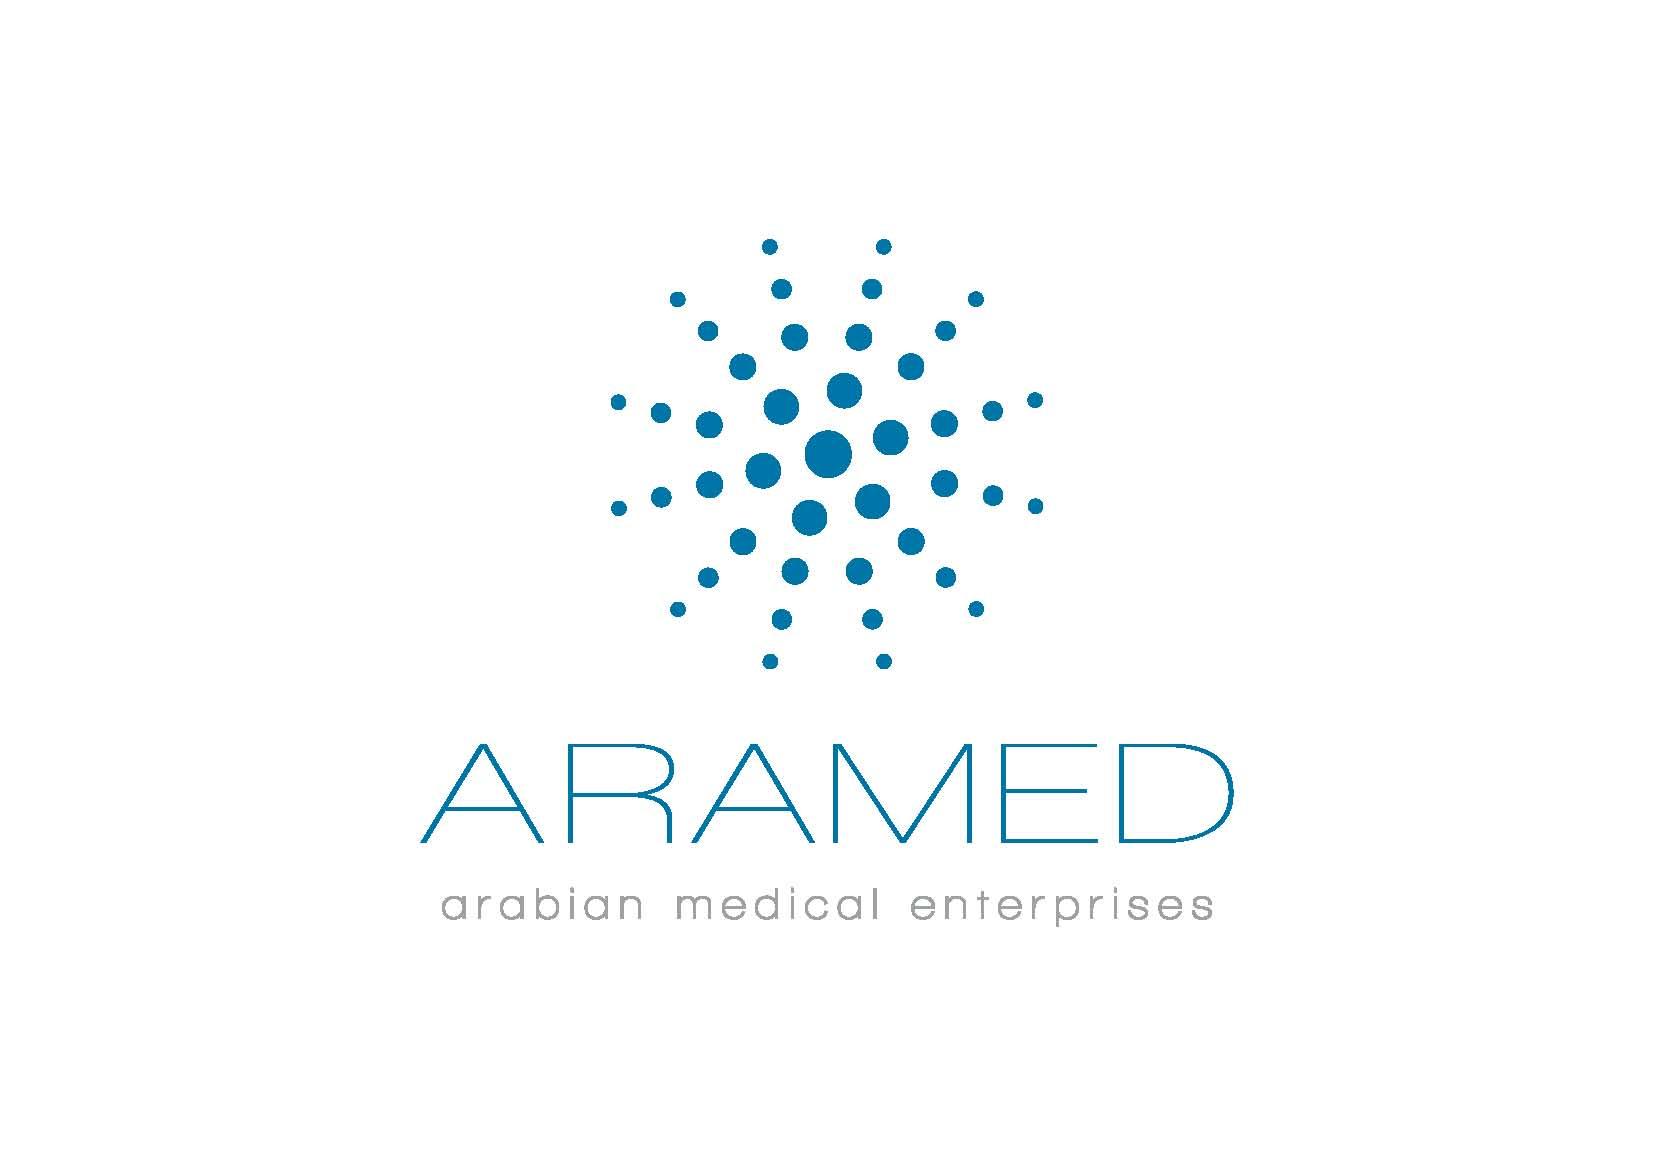 ARAMED | Arabian Medical Enterprises